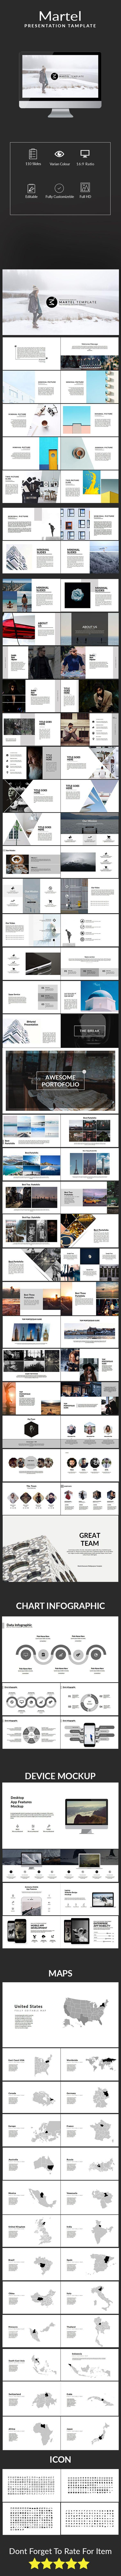 Martel - Multipurpose PowerPoint Template